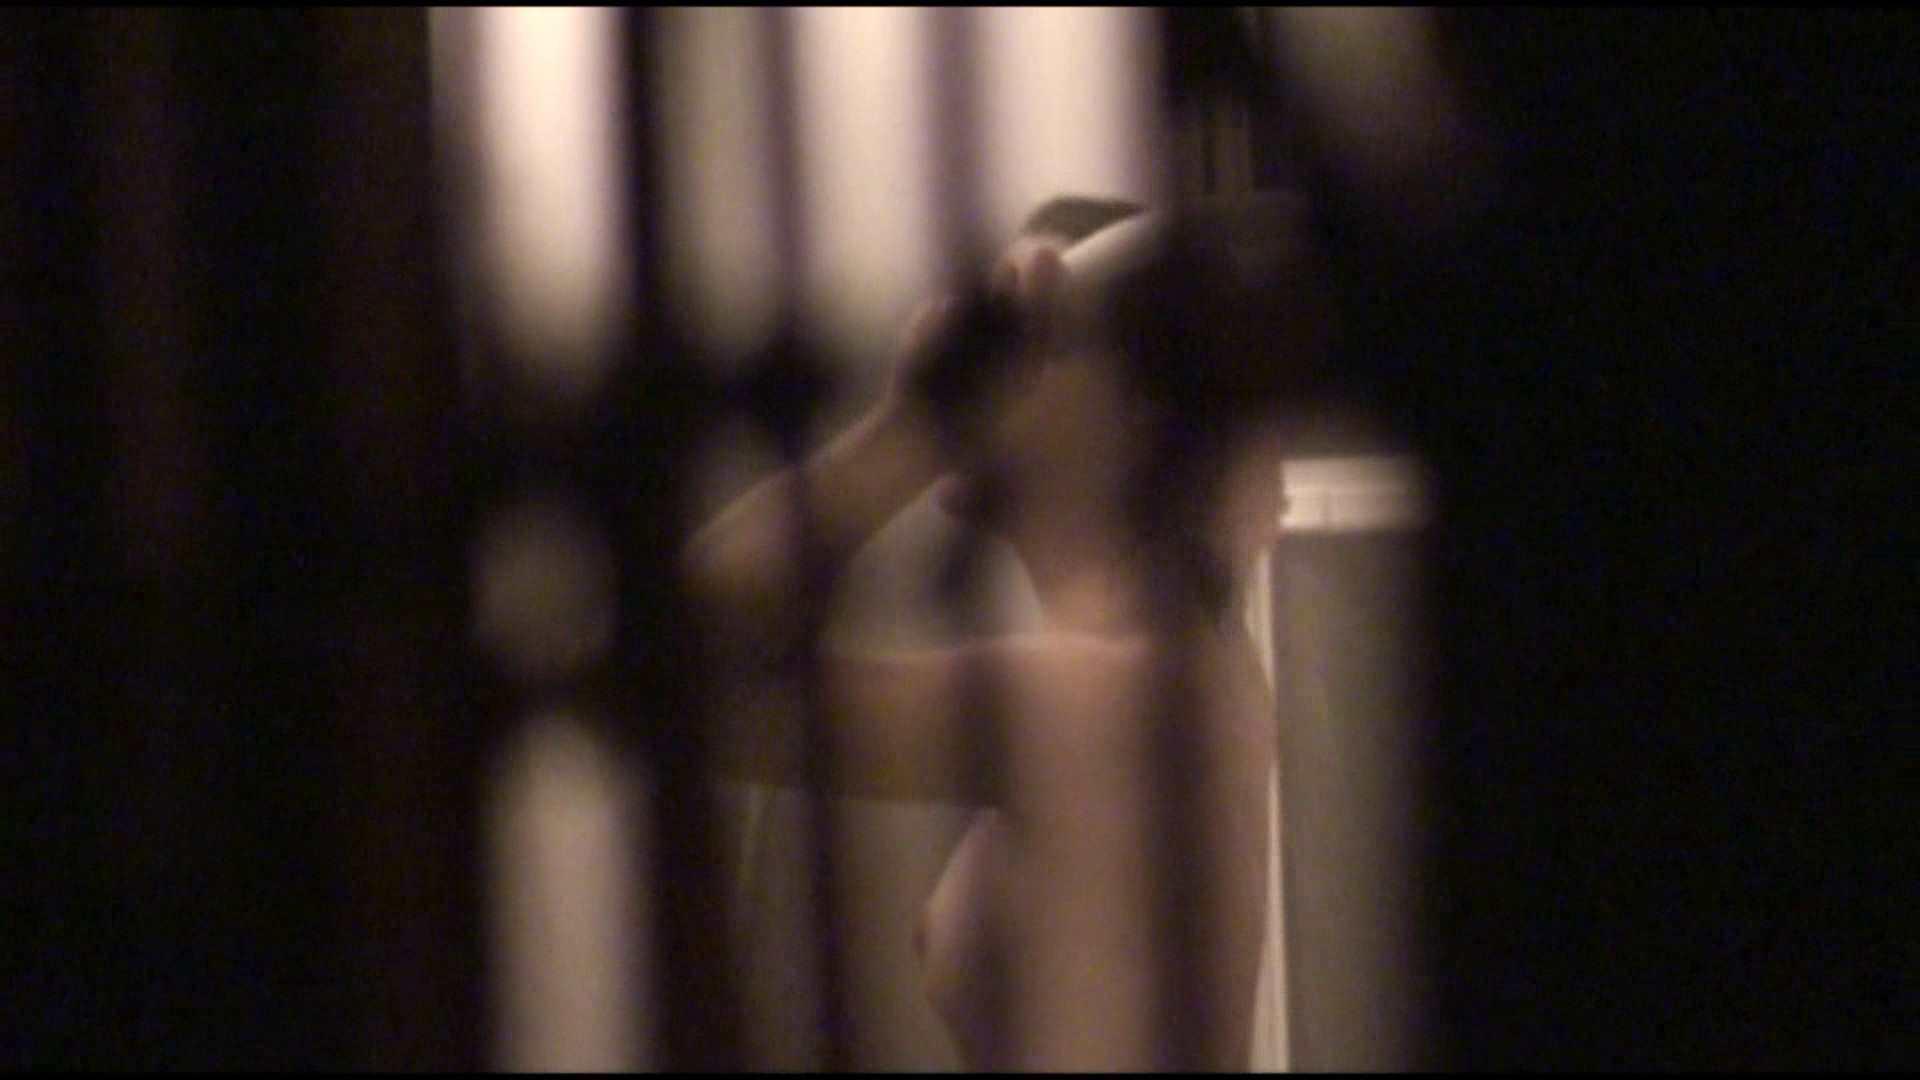 vol.05最高の極上美人!可愛い彼女の裸体をどうぞ!風呂上り鏡チェックも必見!